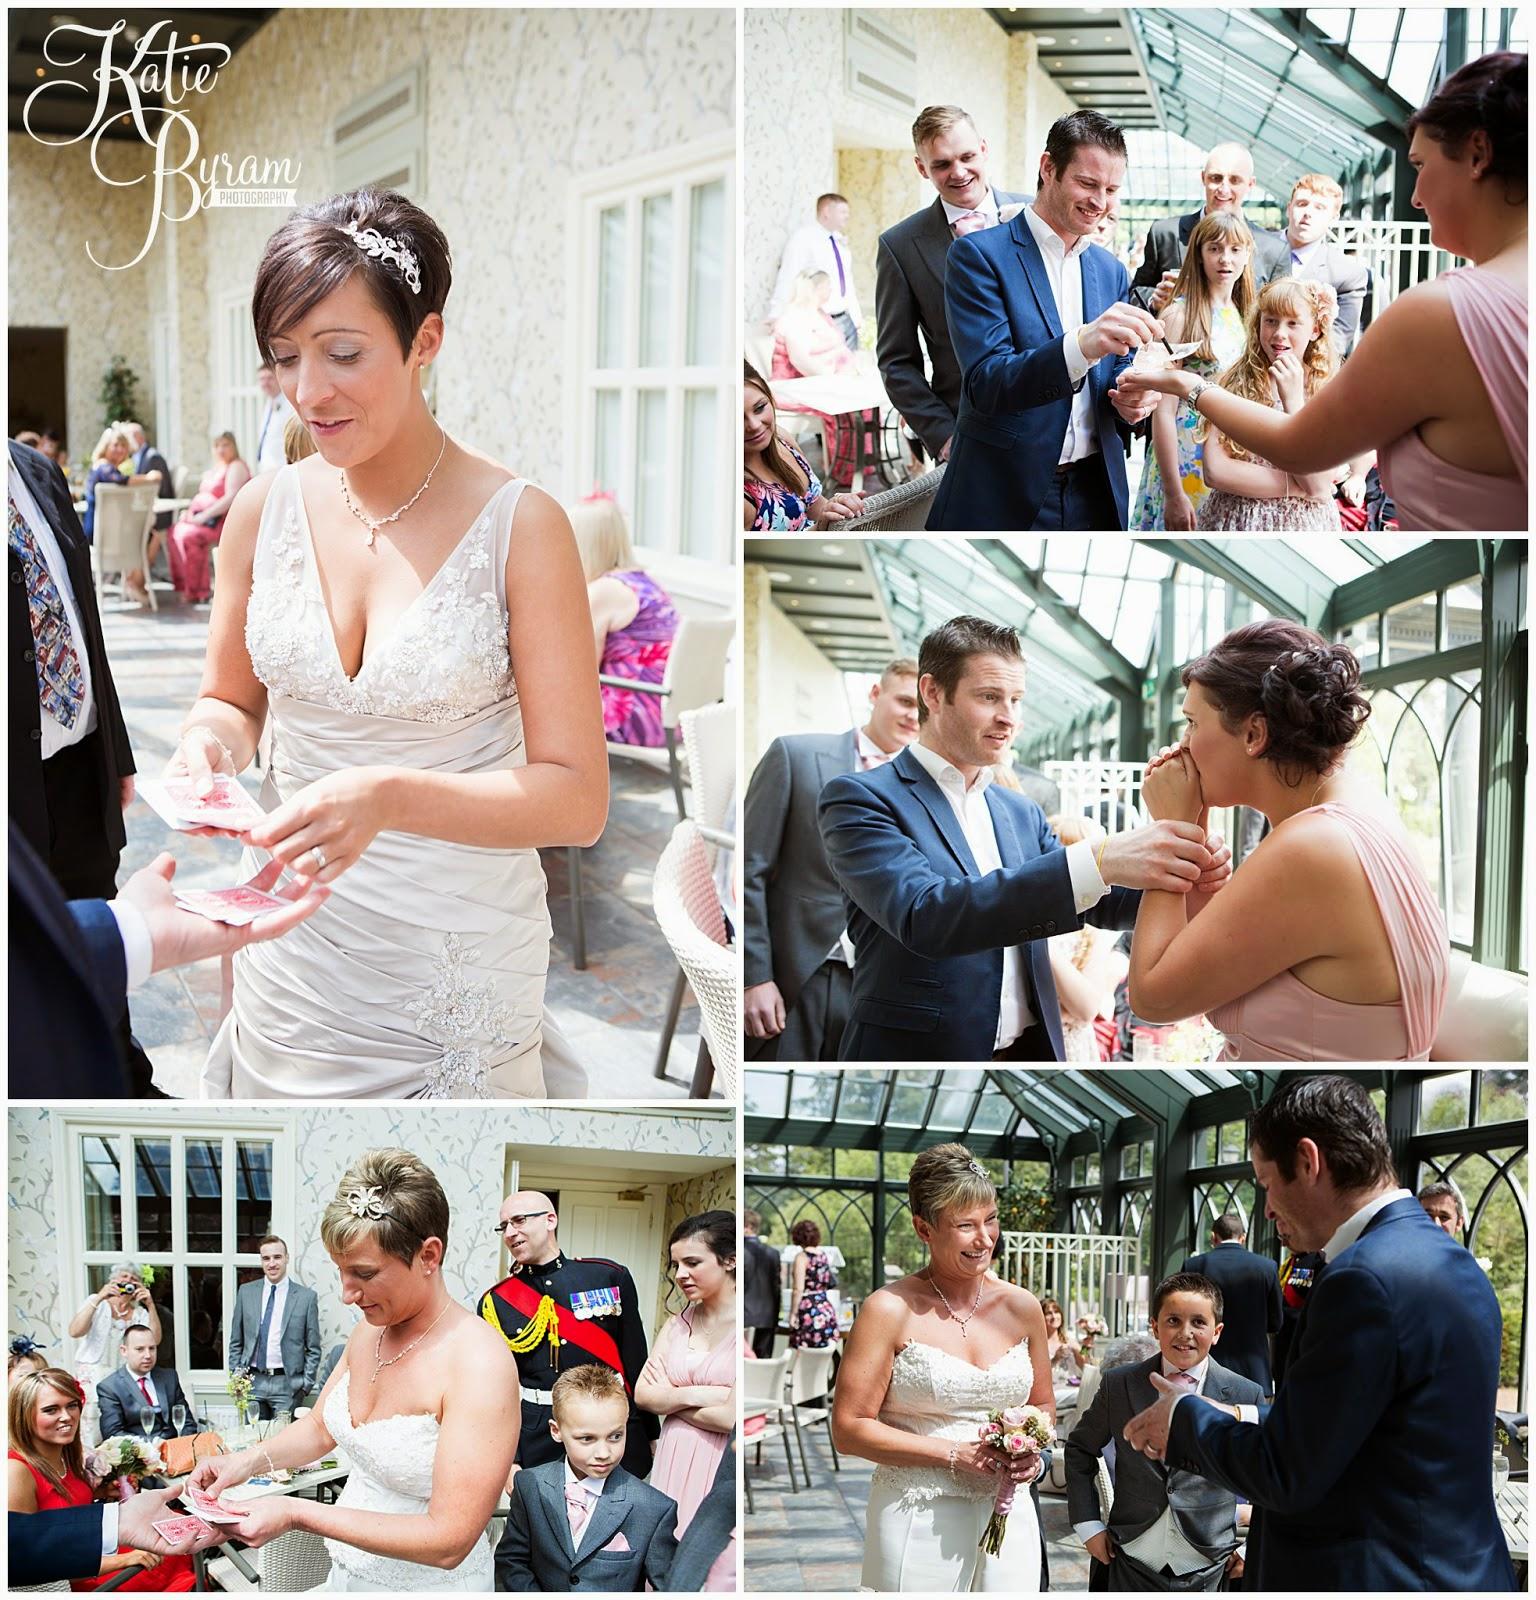 paul lytton wedding magician, two bride wedding, lesbian wedding, lgbt wedding, gisborough hall wedding, north yorkshire wedding photographer, katie byram photographer, same-sex couples, bex bridal, elizabeth george bridal, north yorkshire wedding venues